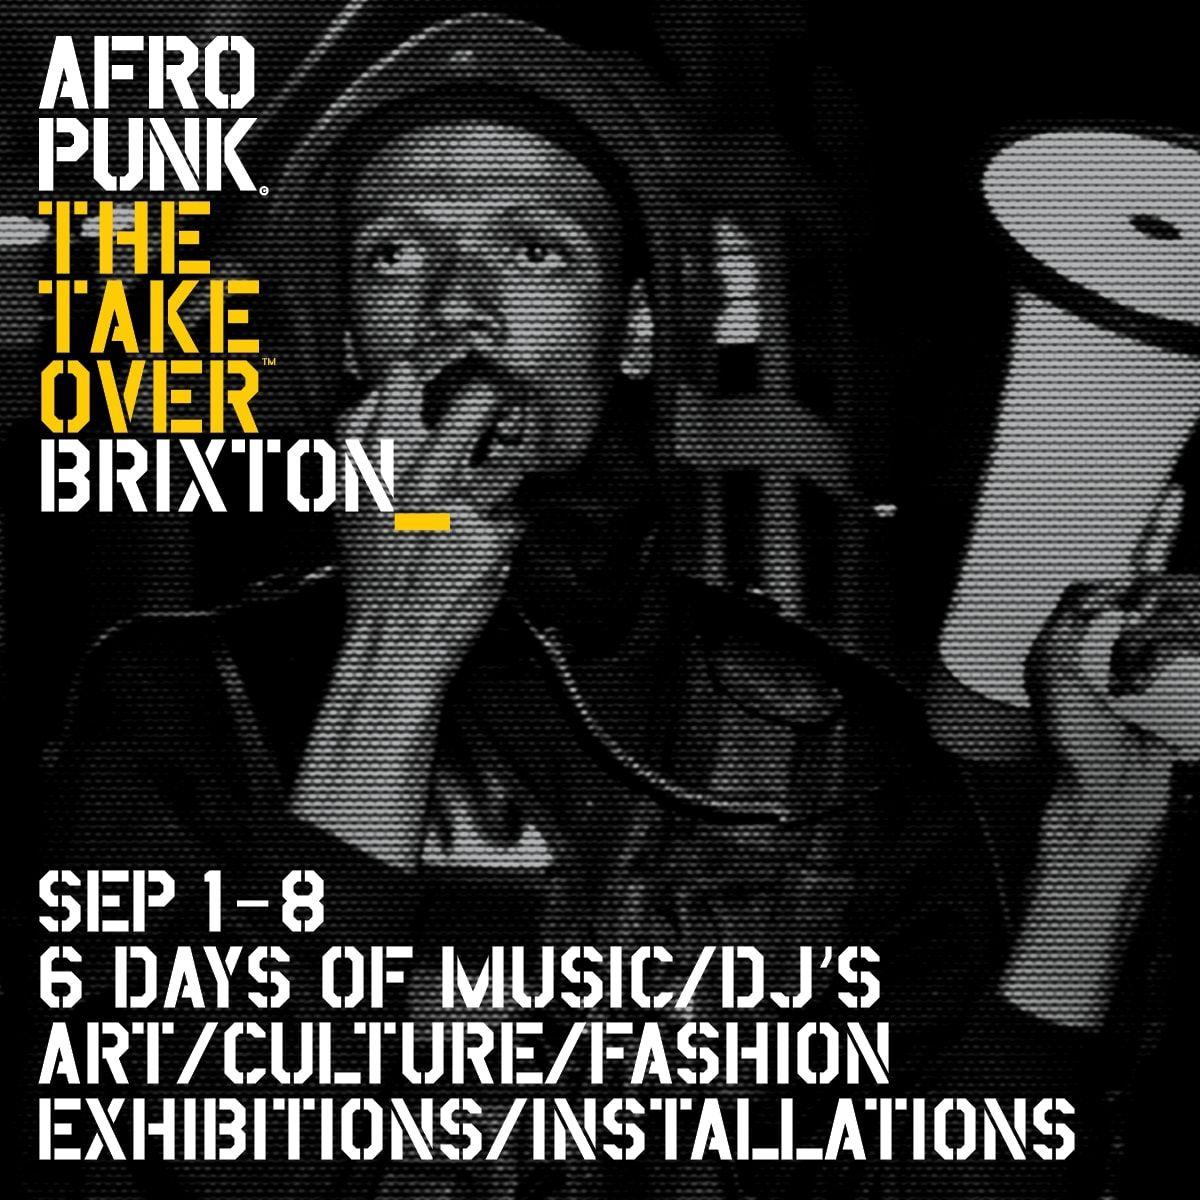 afropunk_takeover_brixton.jpg